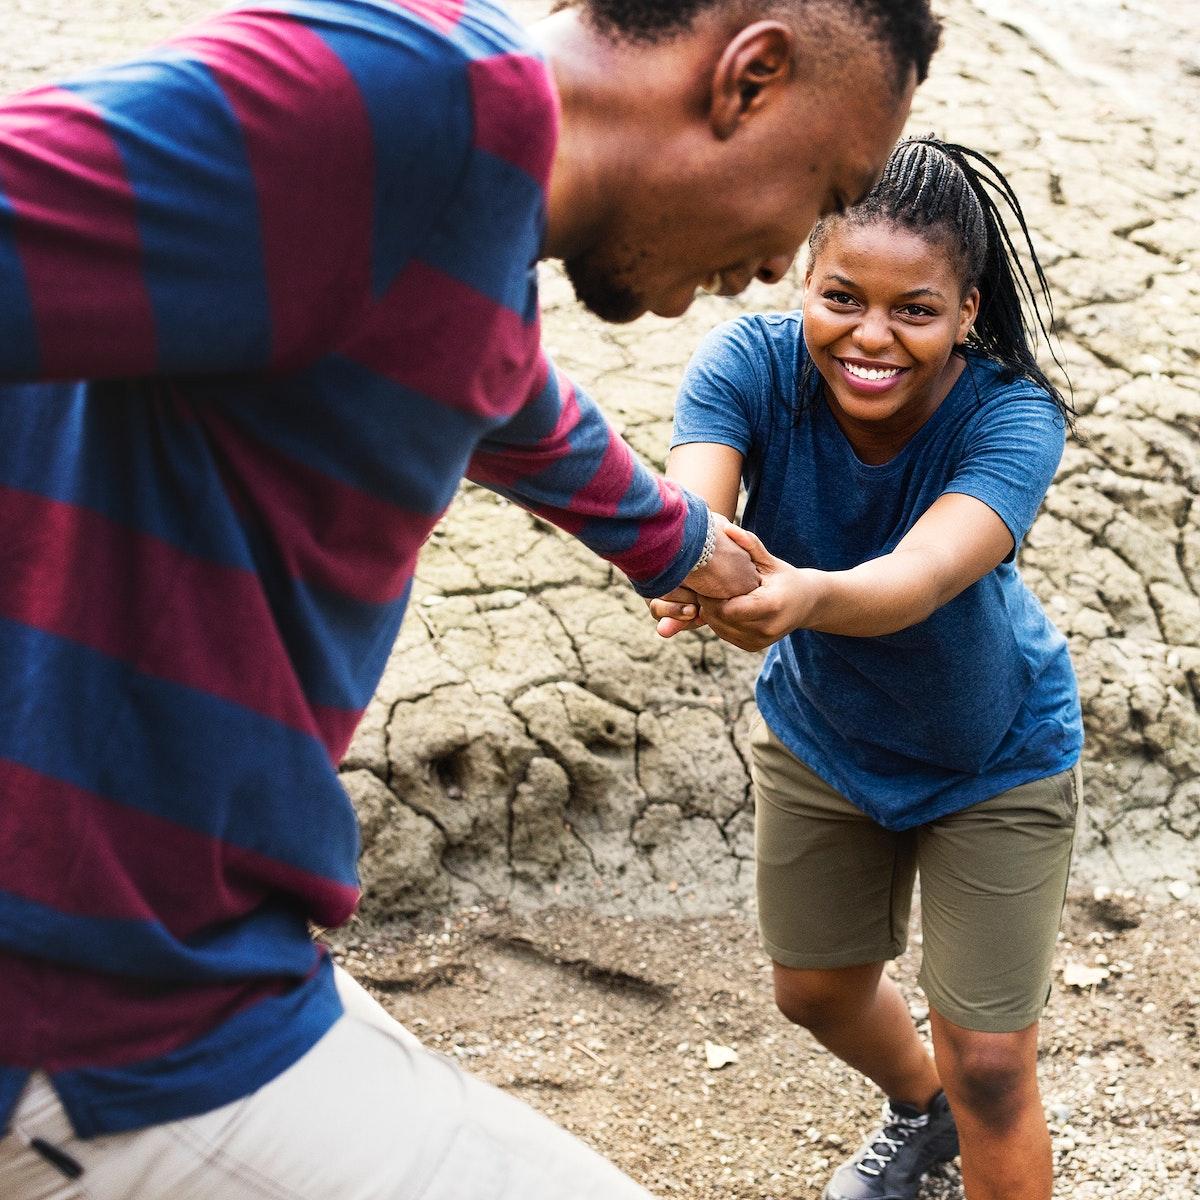 Man helping his girlfriend on a trek